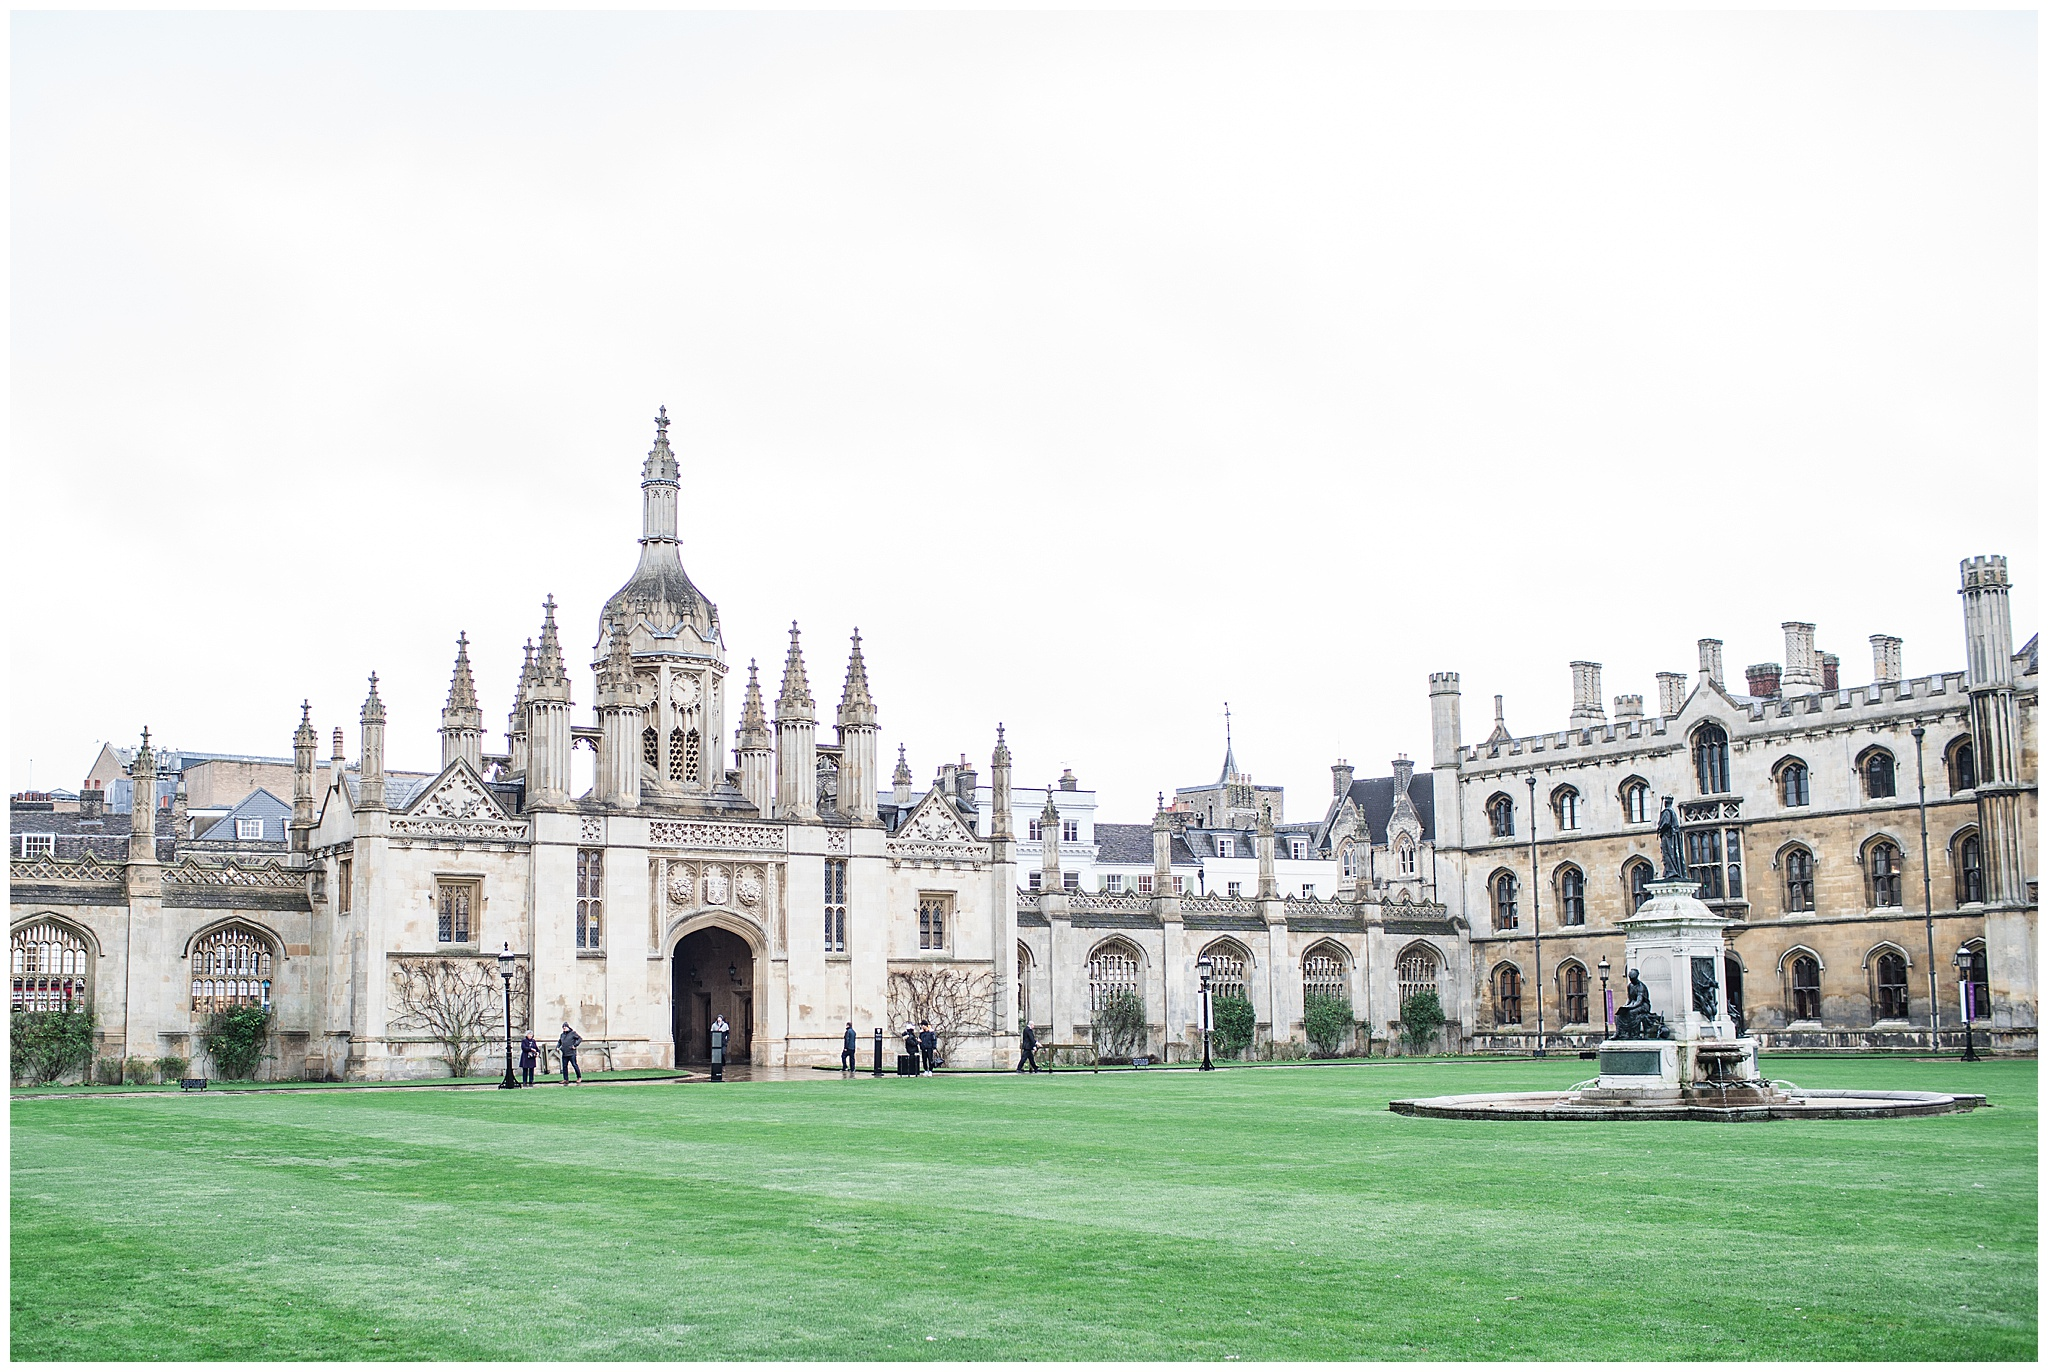 Cambridge_day2_0185.jpg